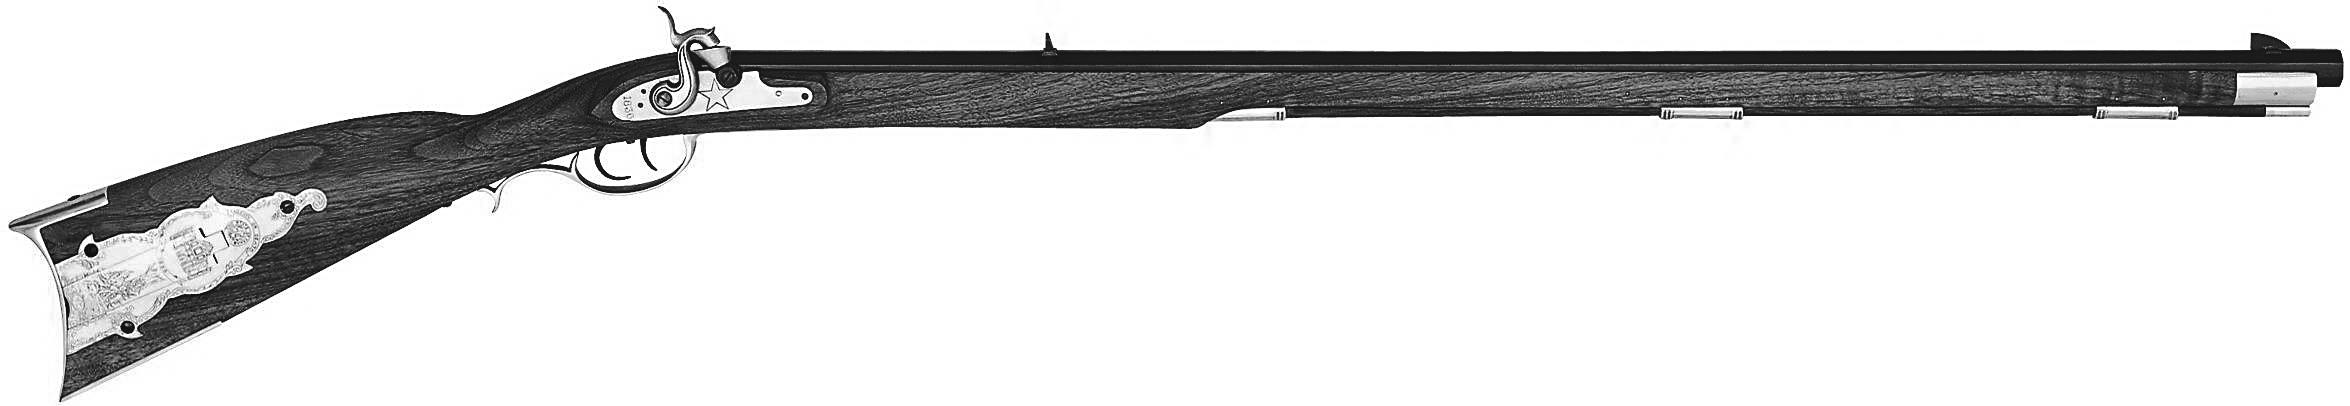 Alamo Rifle